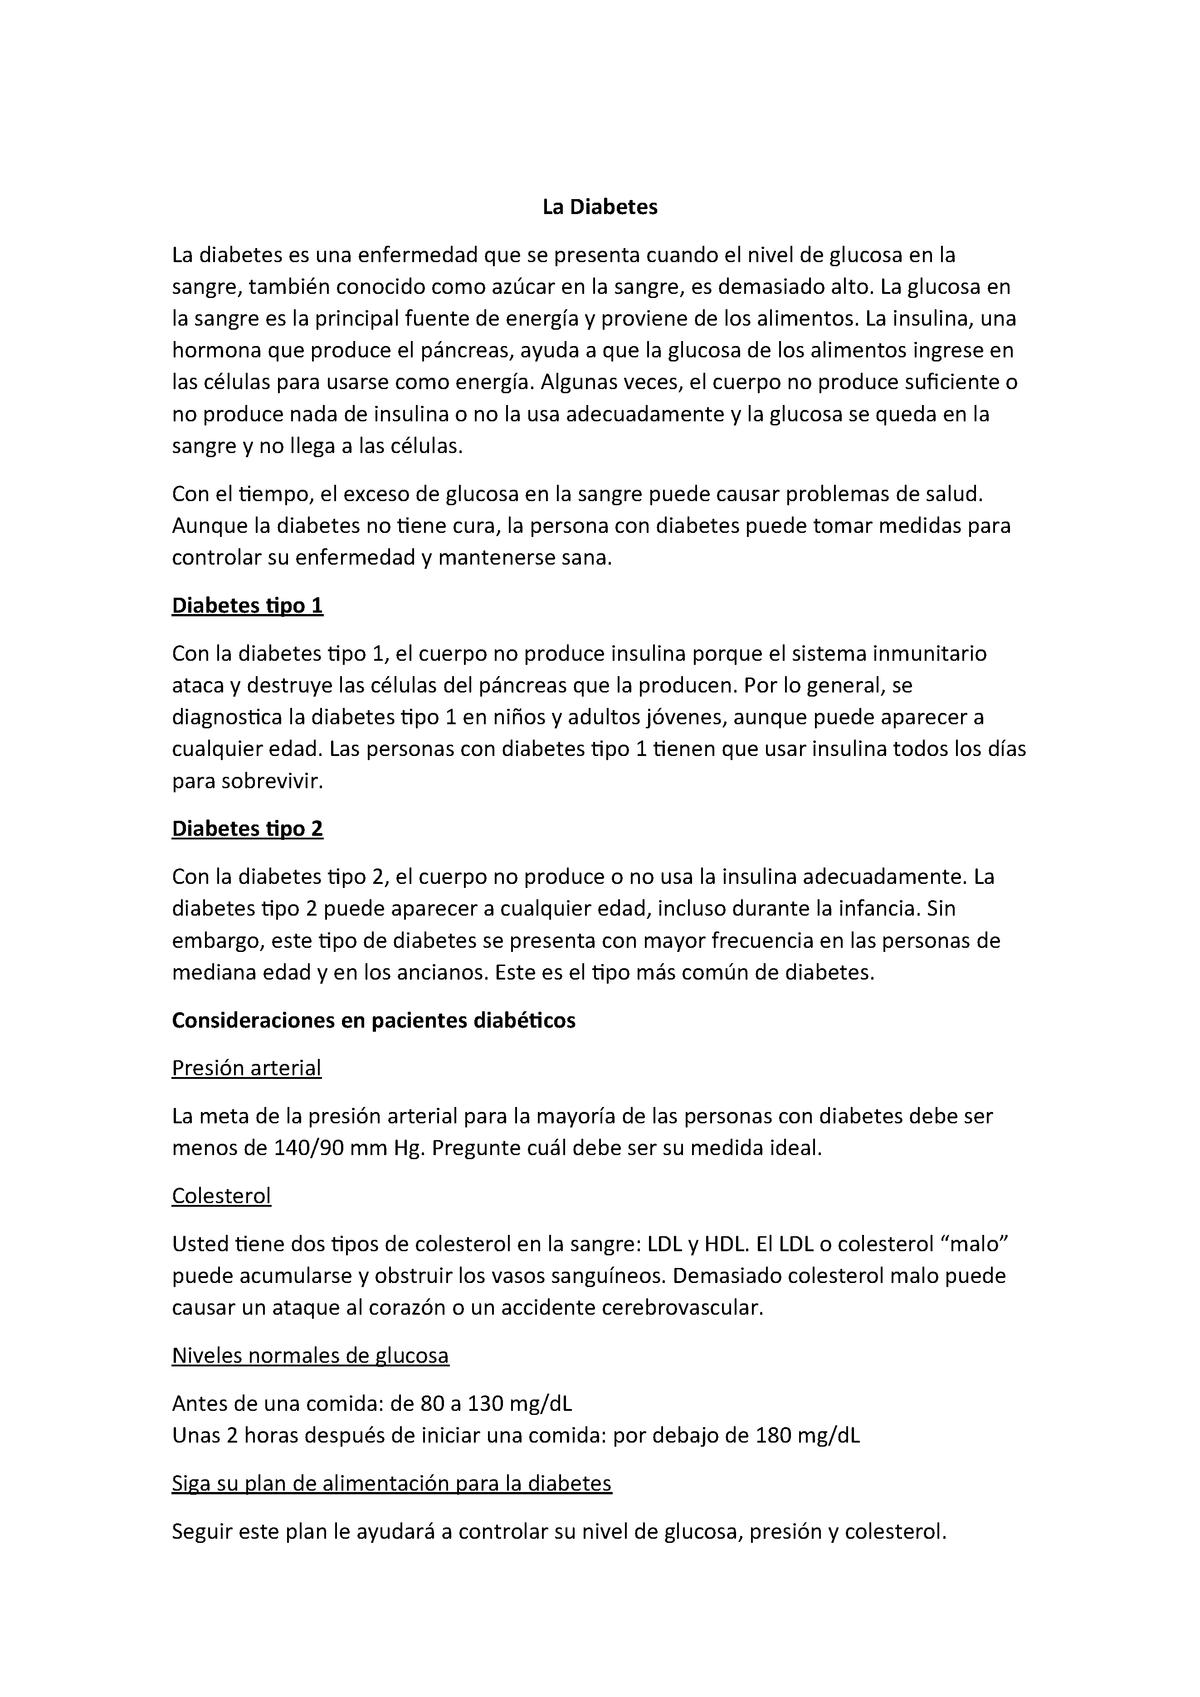 sistema inmunitario para diabetes tipo 1